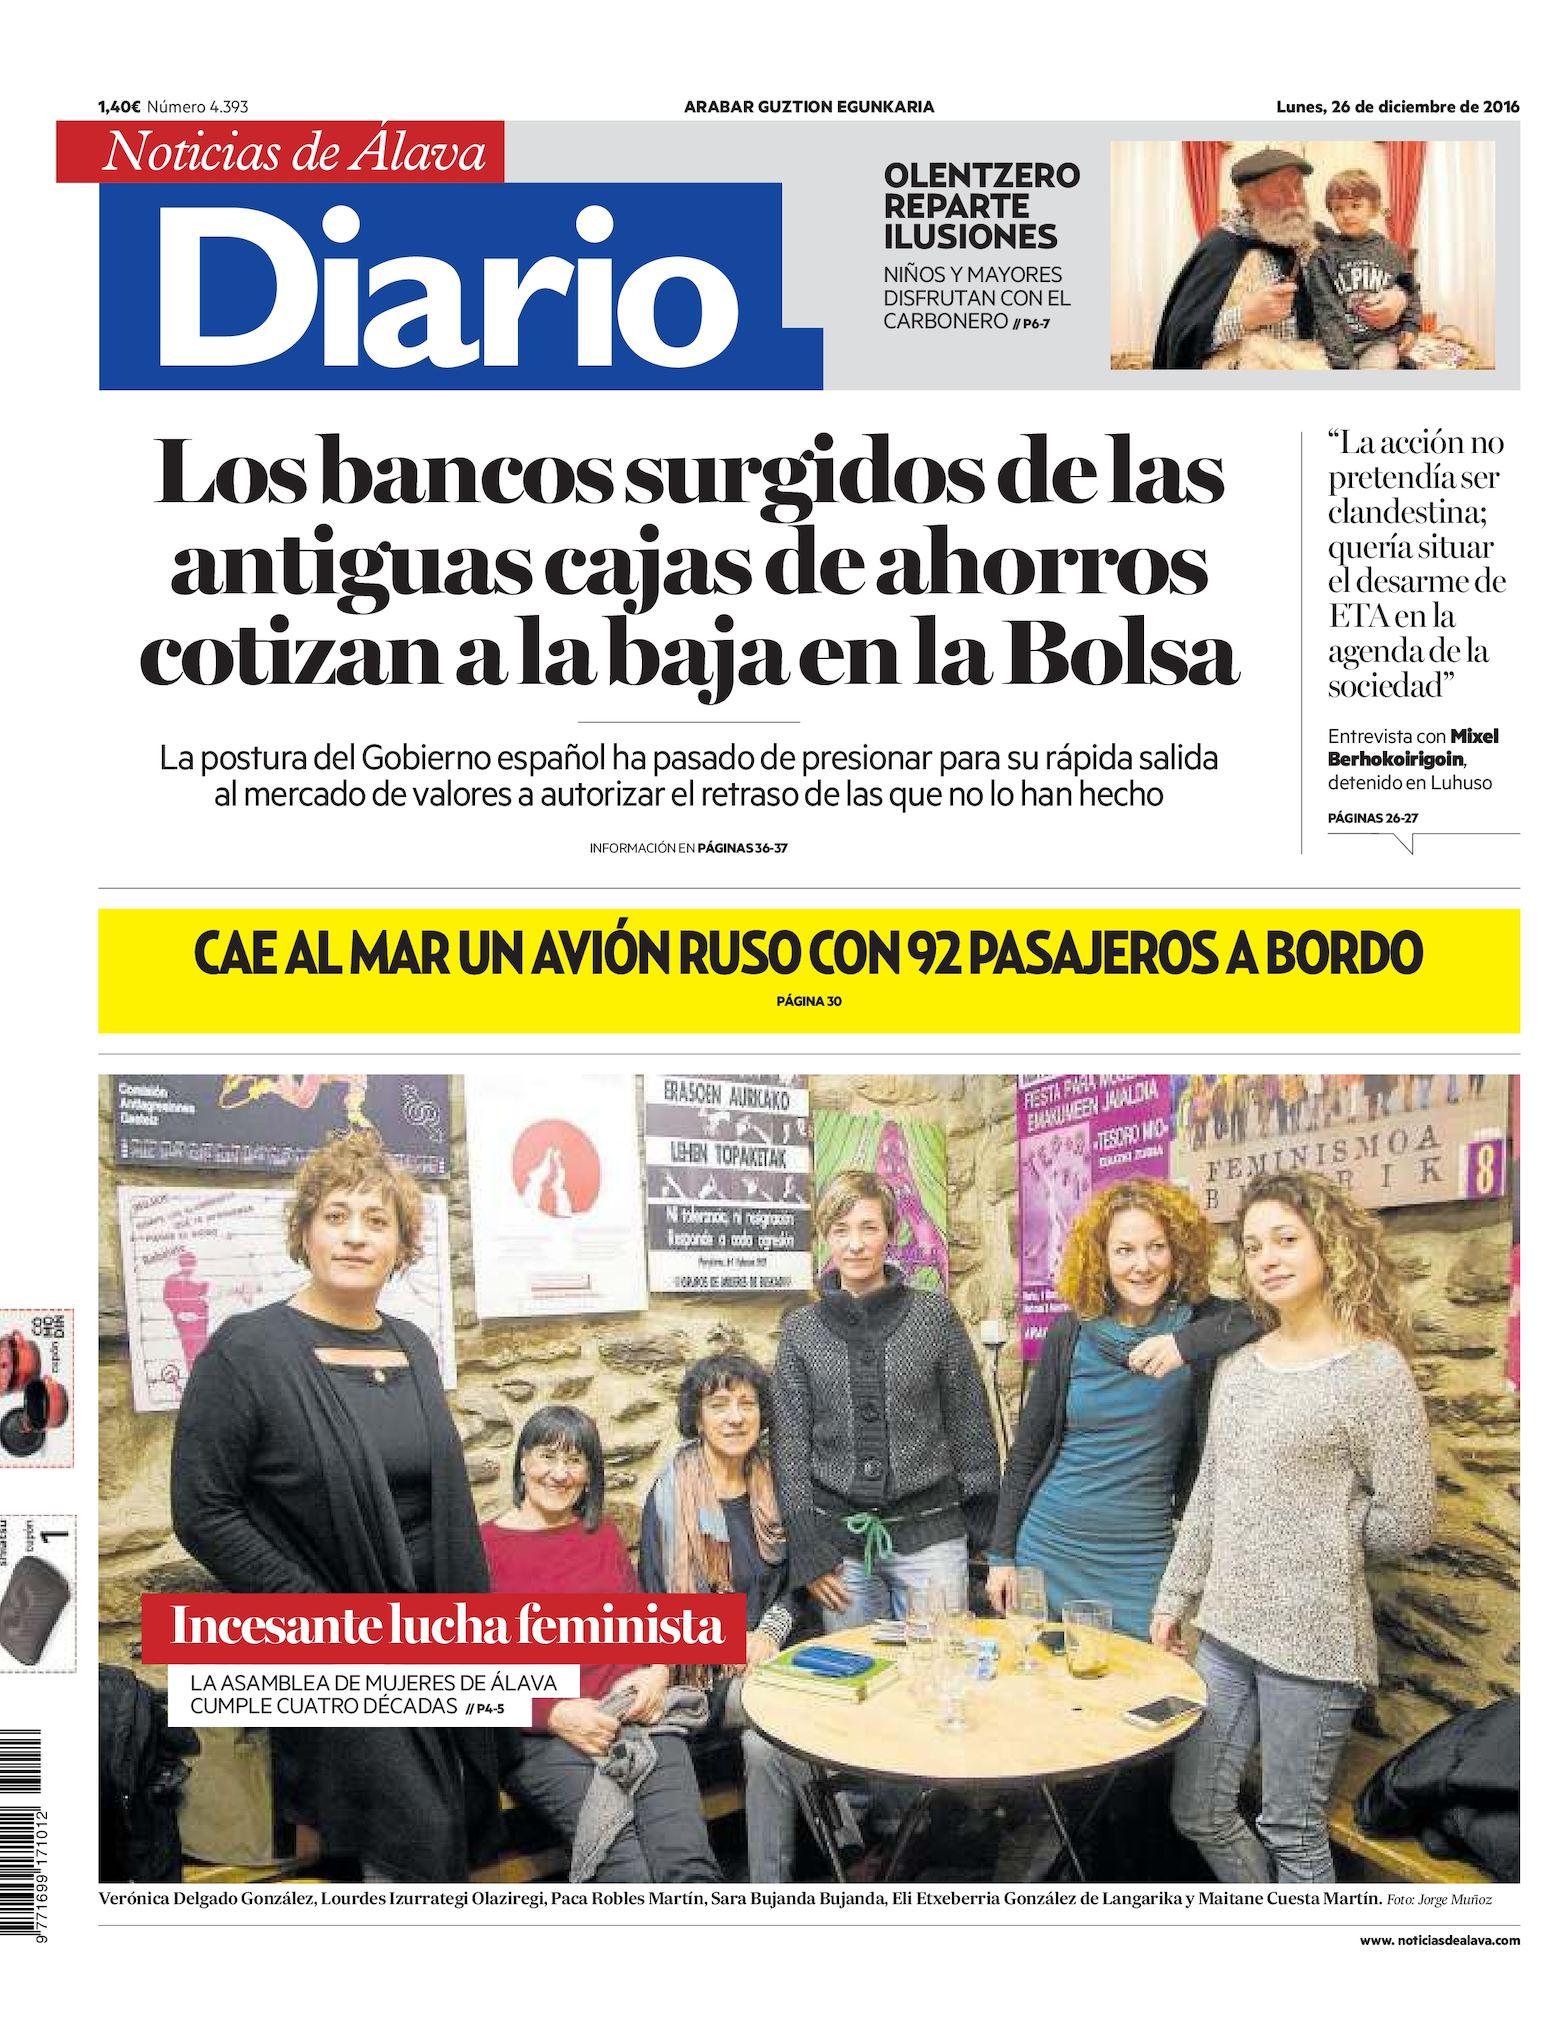 Ainhoa Madrid David Moreno Porno calaméo - diario de noticias de Álava 20161226